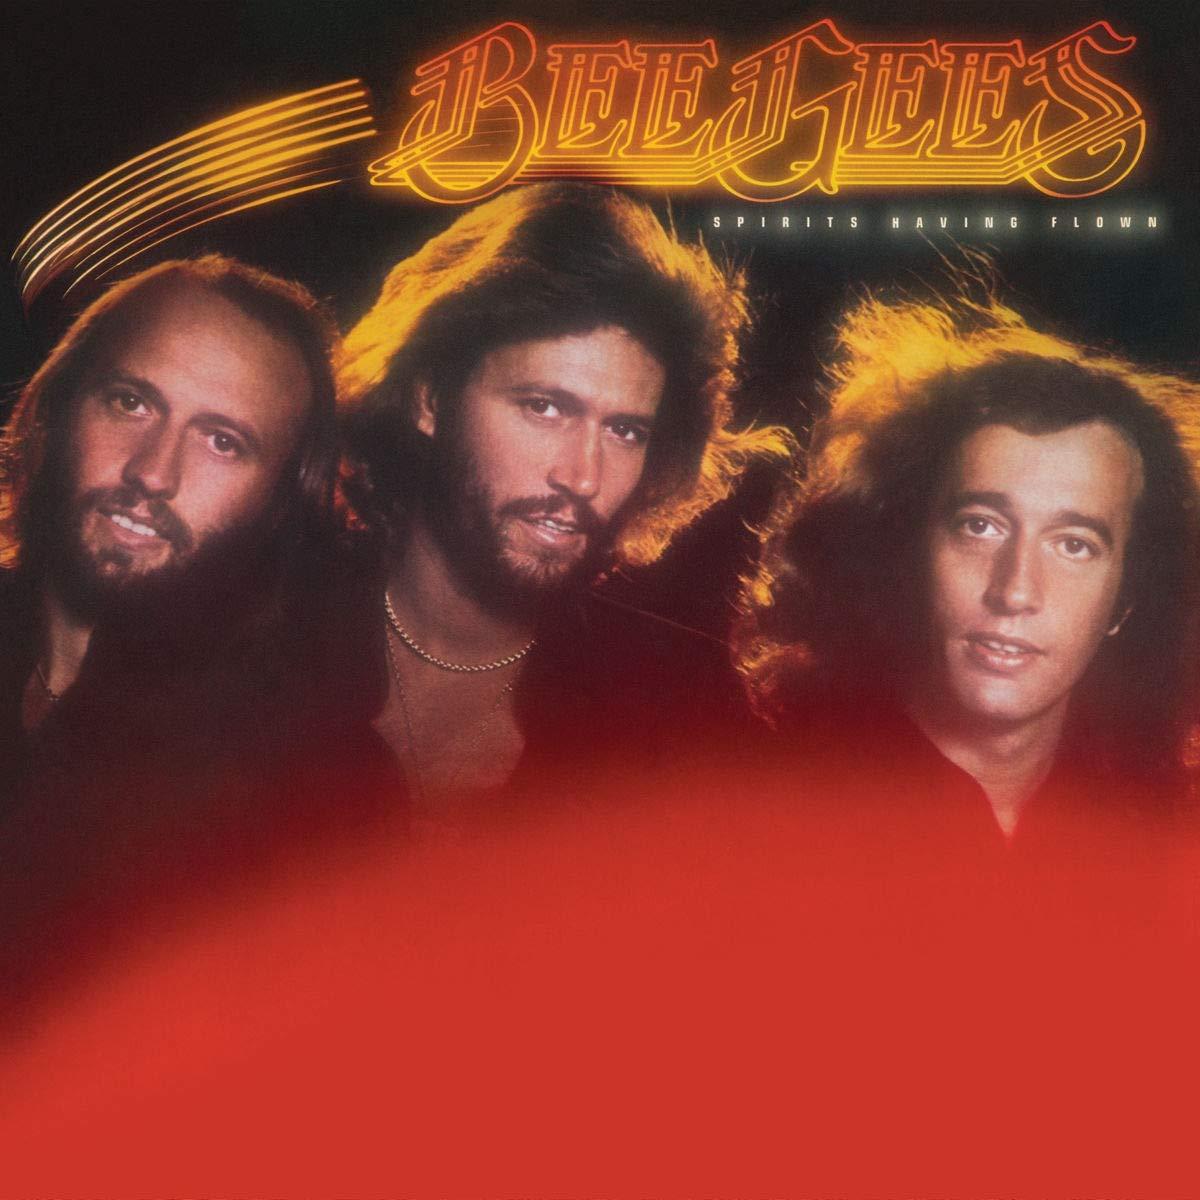 Bee Gees – Spirits Having Flown (1979) [FLAC]